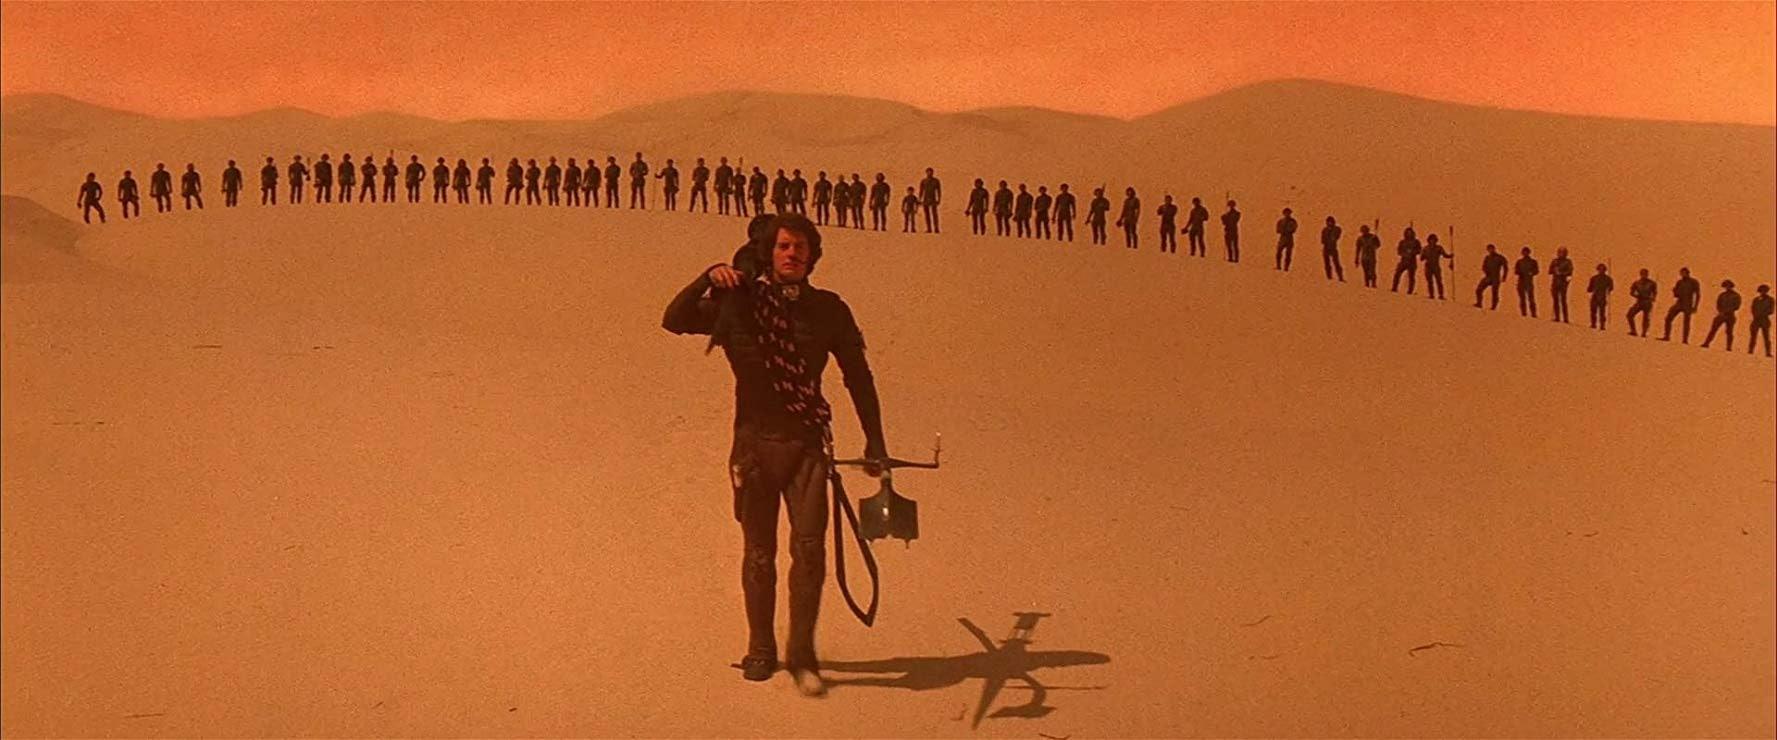 Kyle McLachlan in 1984's Dune